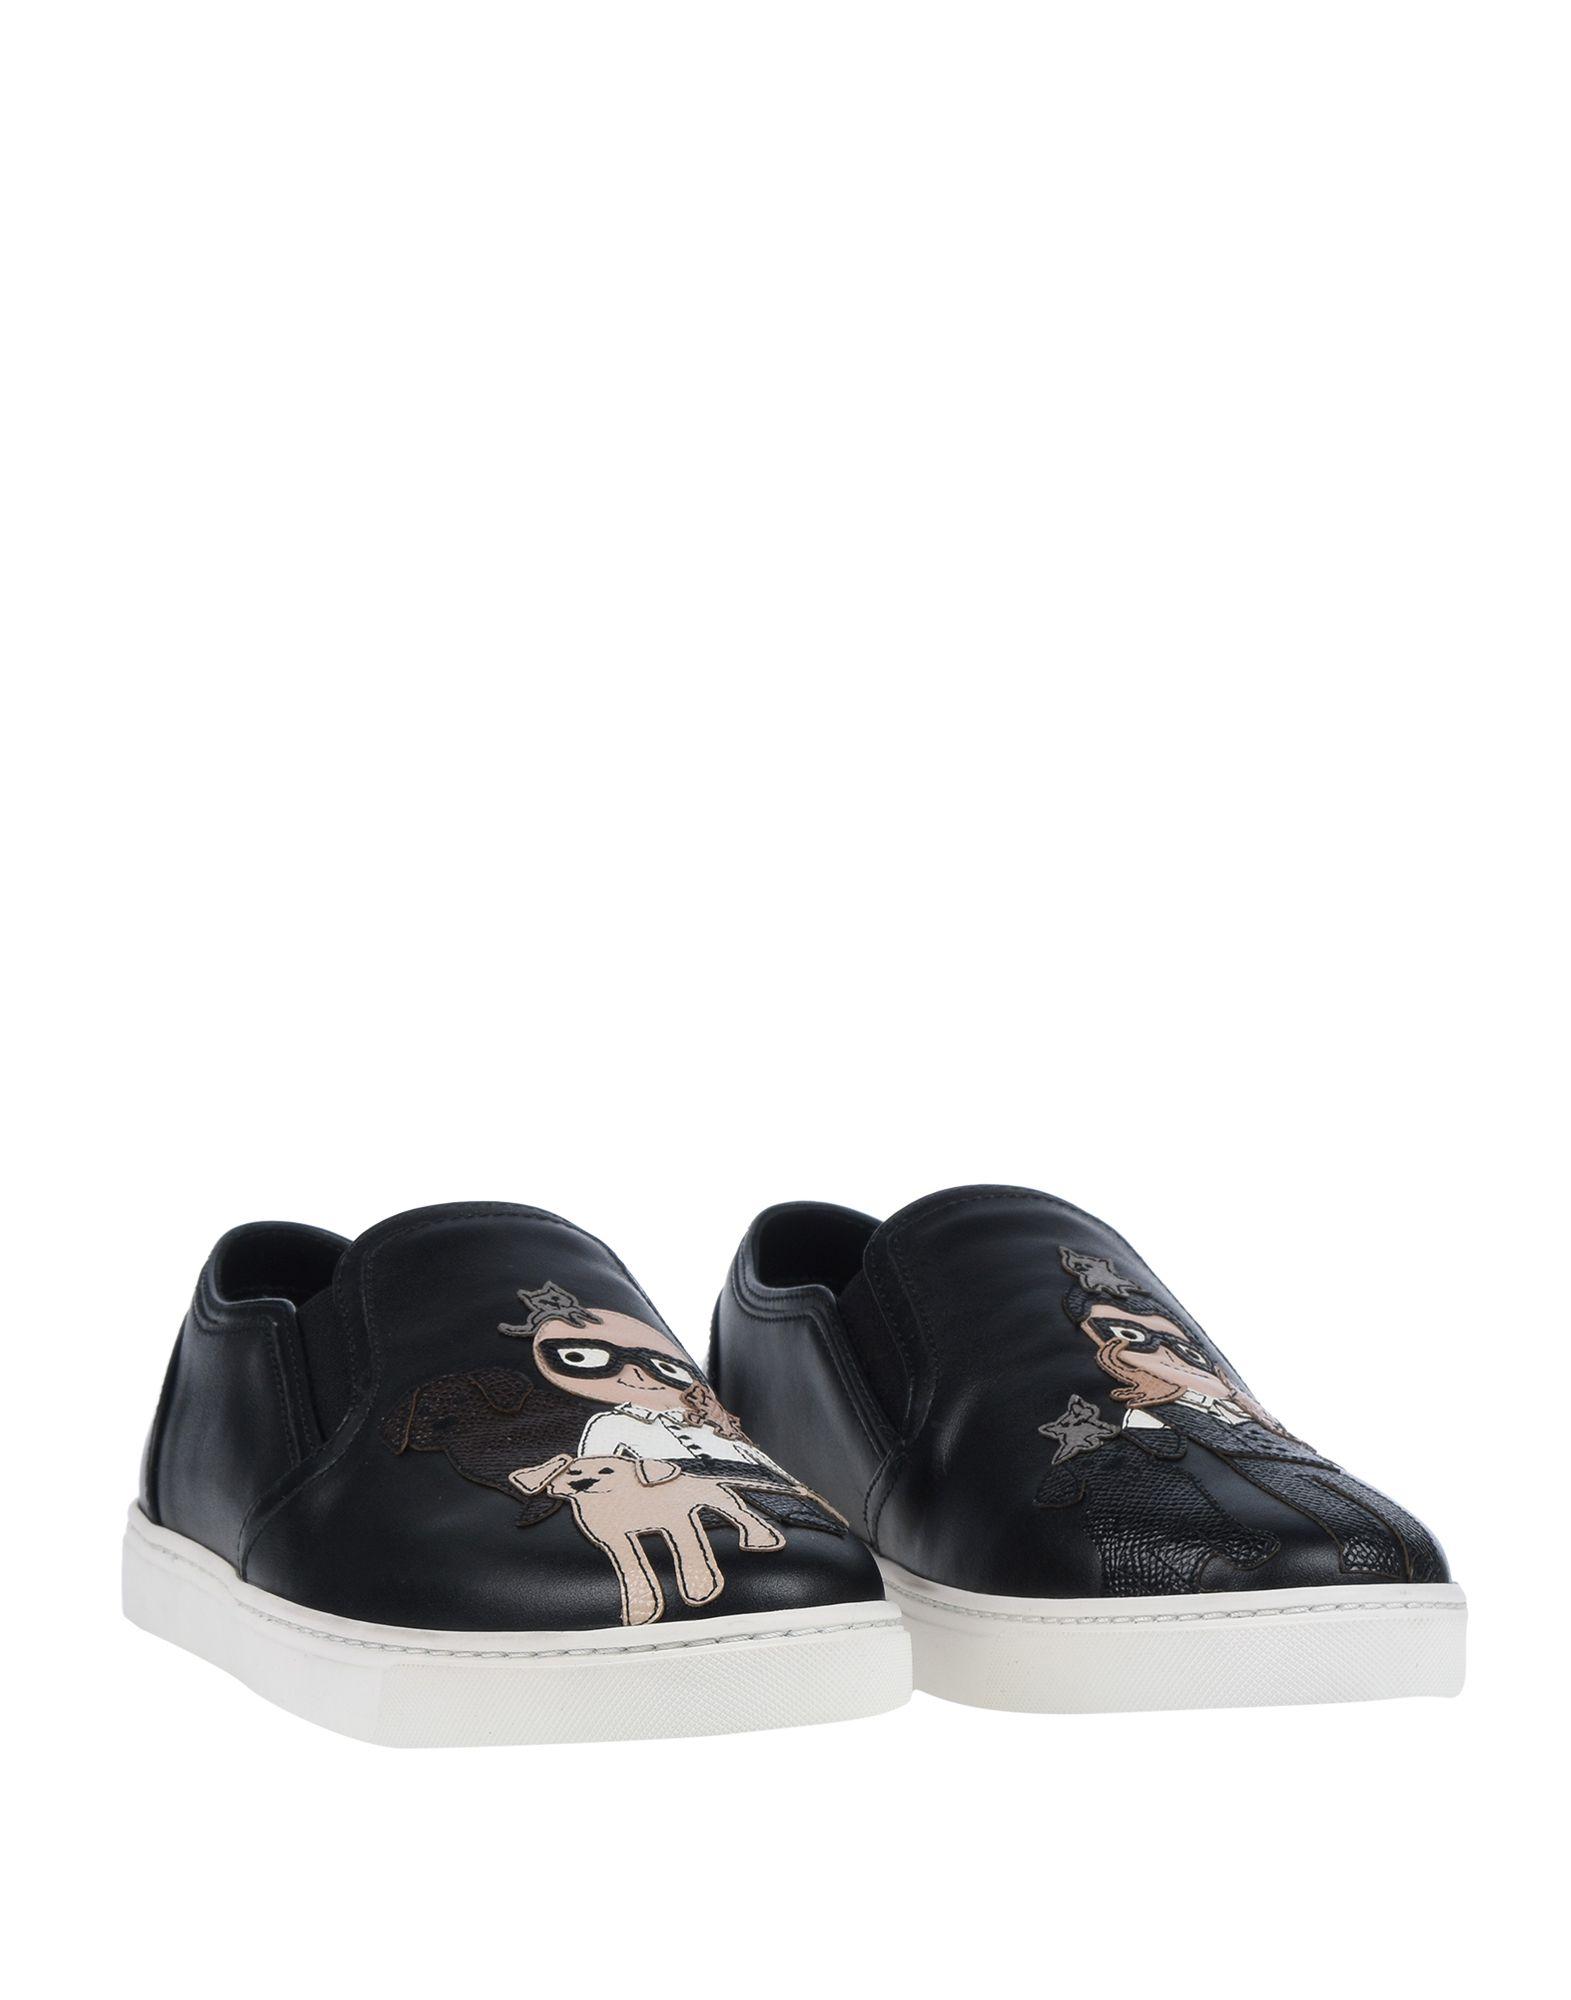 Dolce & Gabbana Sneakers Damen Schuhe  11220389EKGünstige gut aussehende Schuhe Damen 534ffb